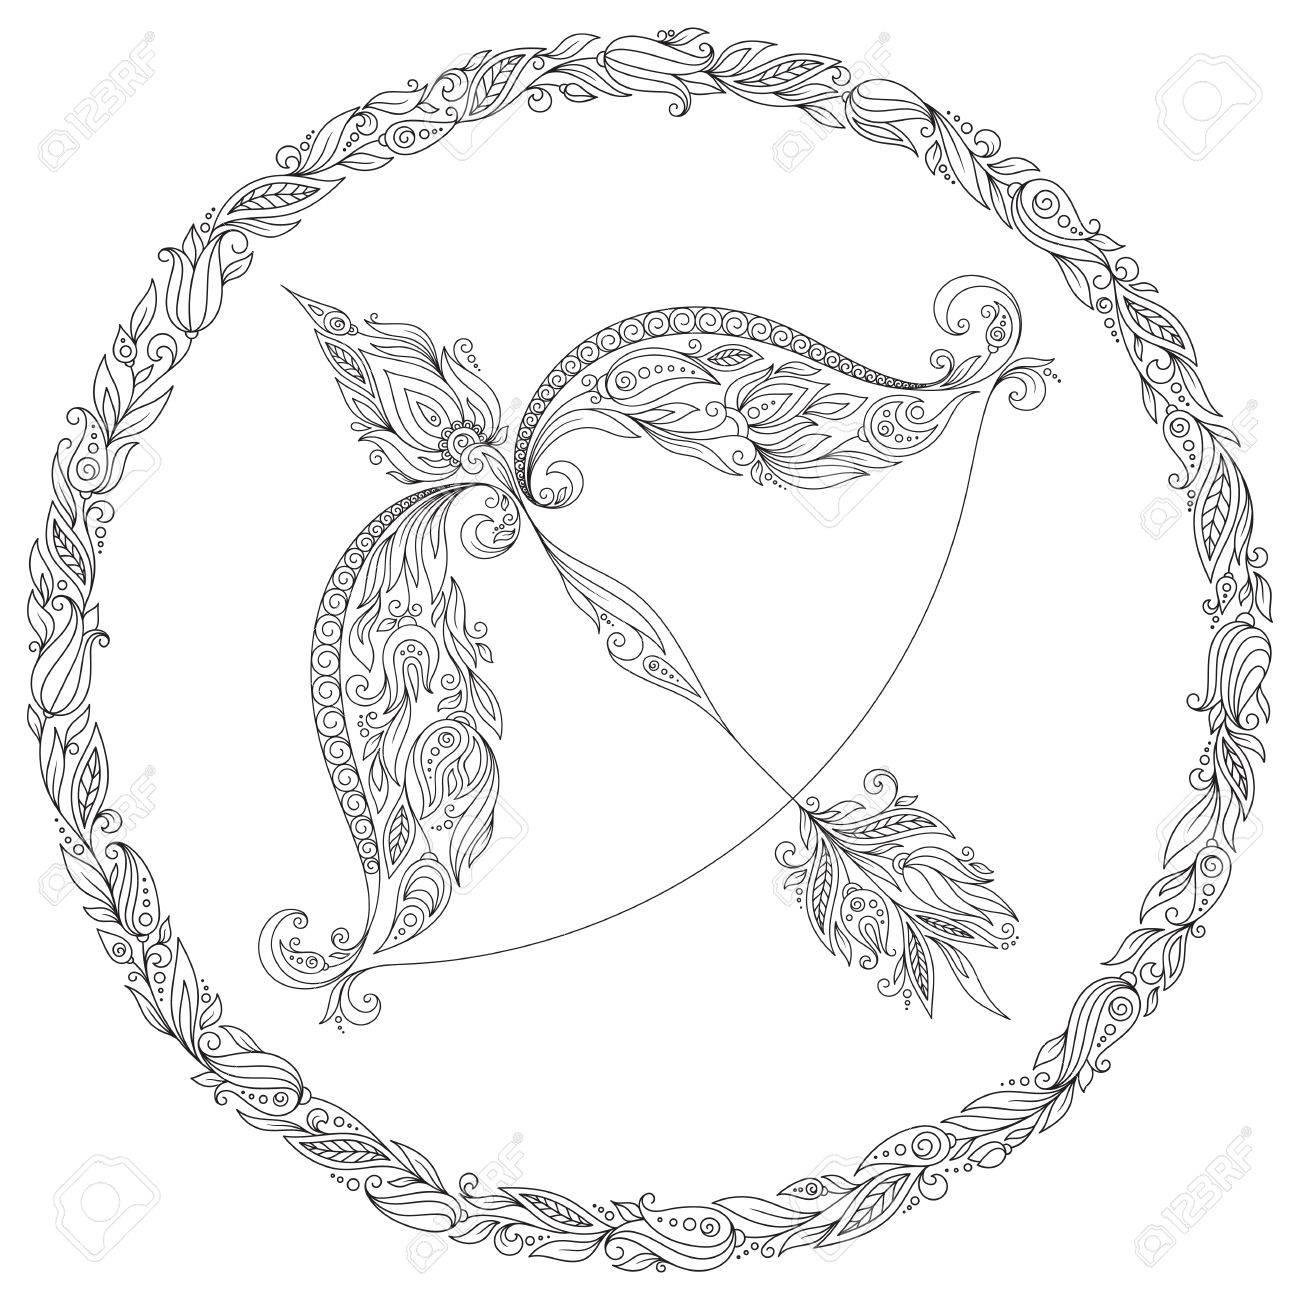 Patron De Libro Para Colorear De Las Flores Linea Arte De Zodiaco